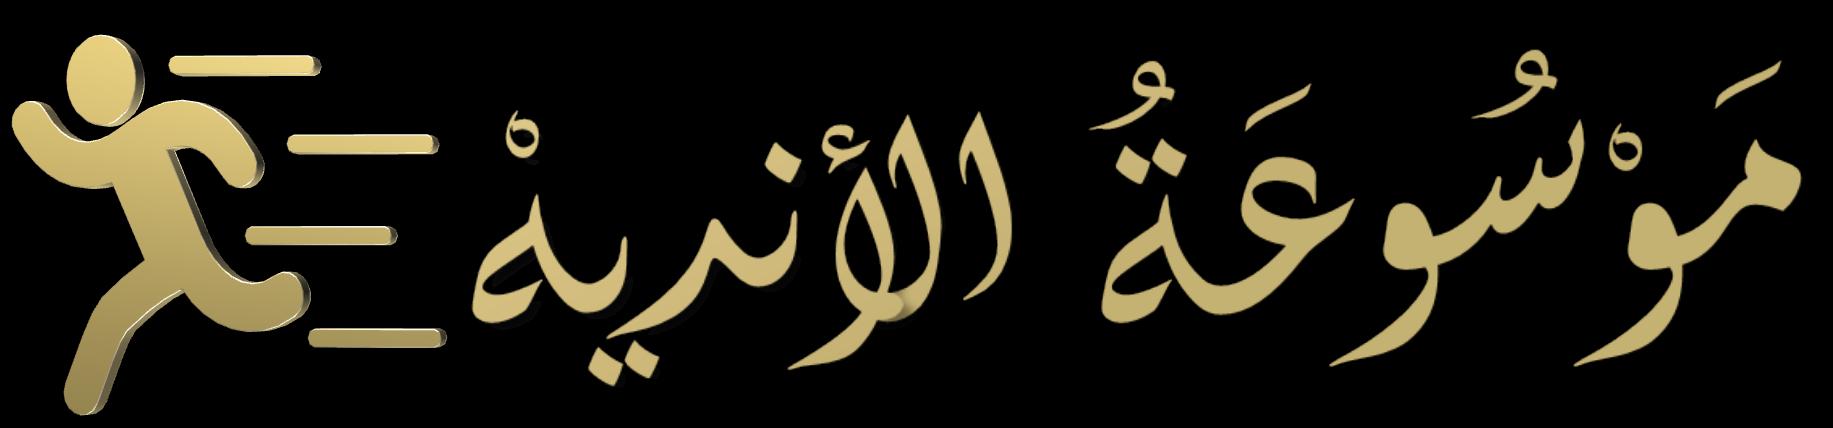 Wiki Clubs تاريخ النادى الاهلي المصري